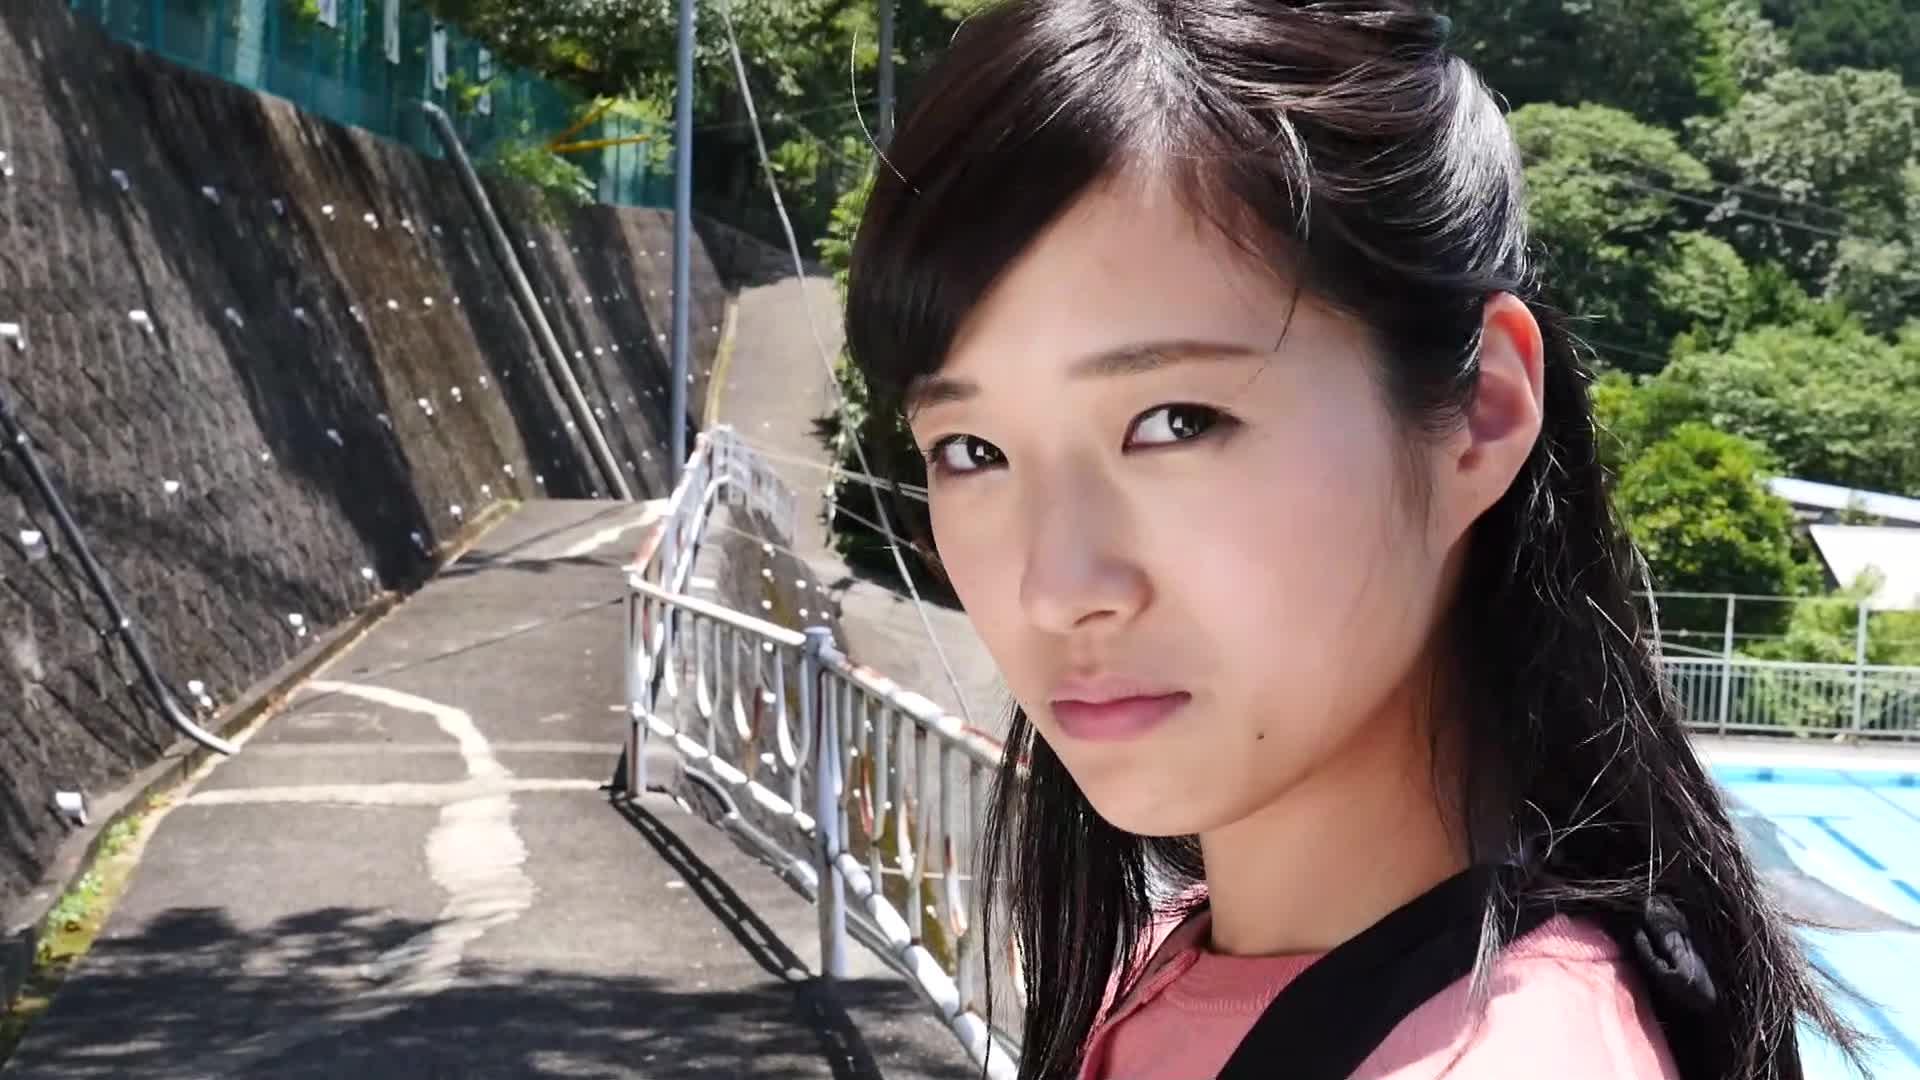 c4 - みすど 魅惑の透明感/宮脇麻那